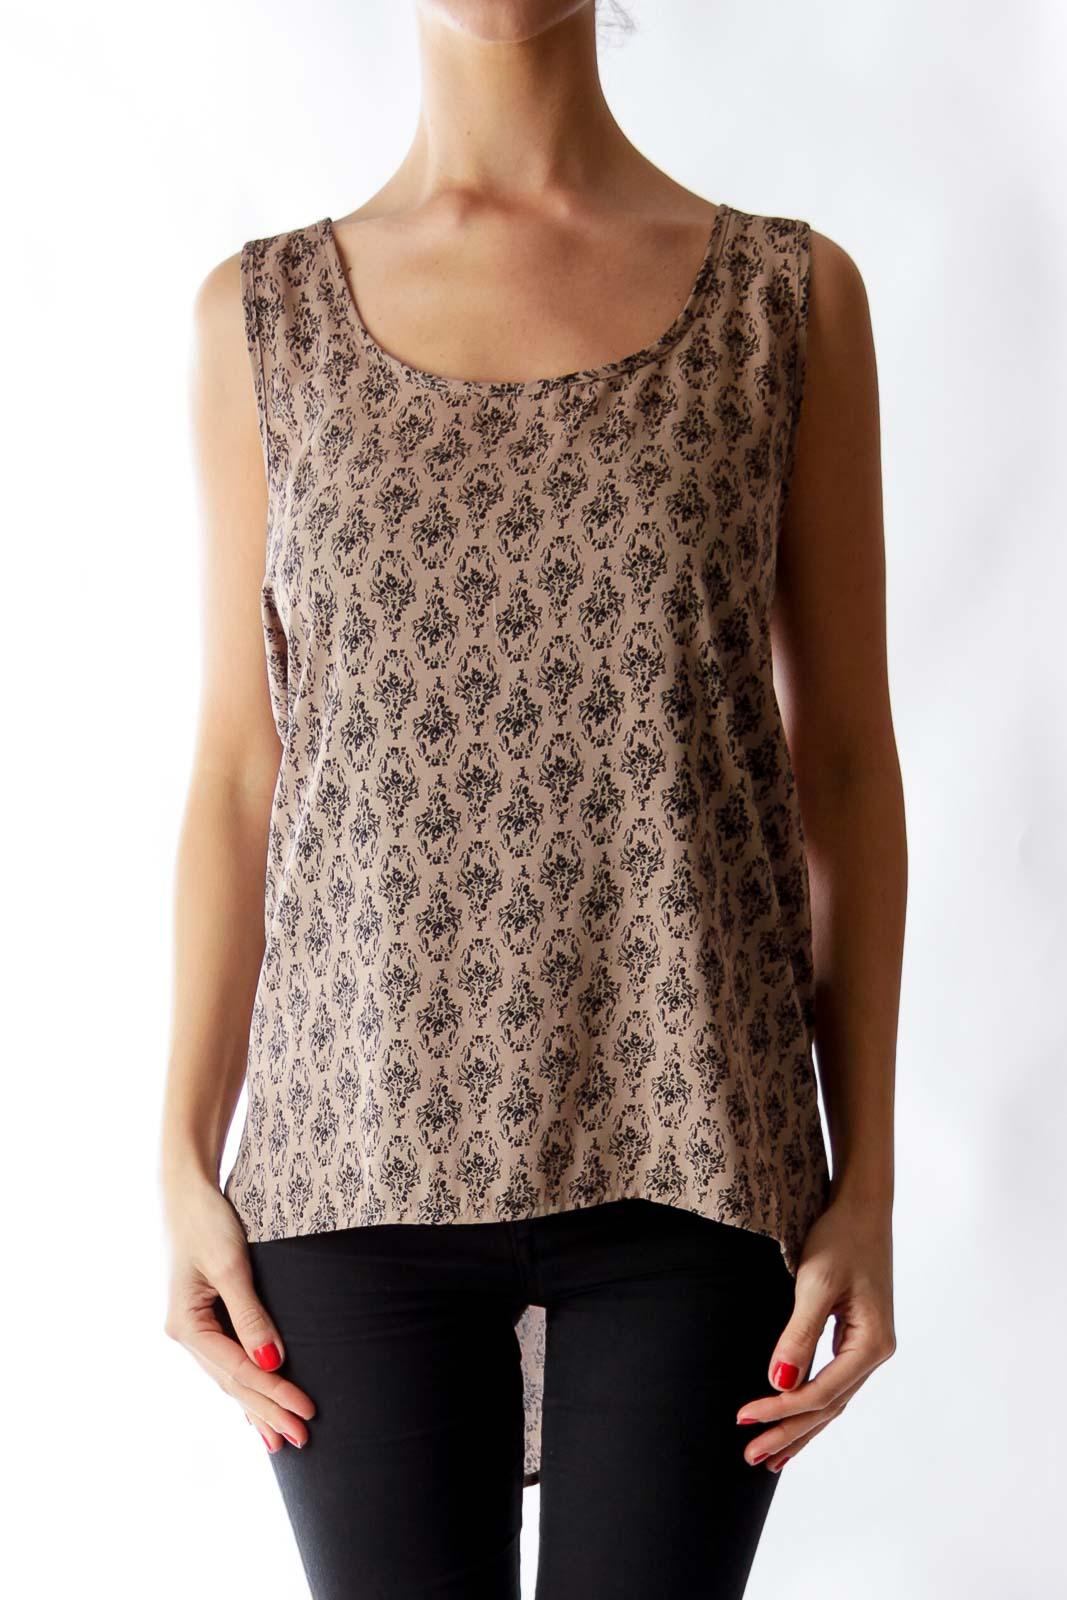 Brown & Black Print Shirt Front